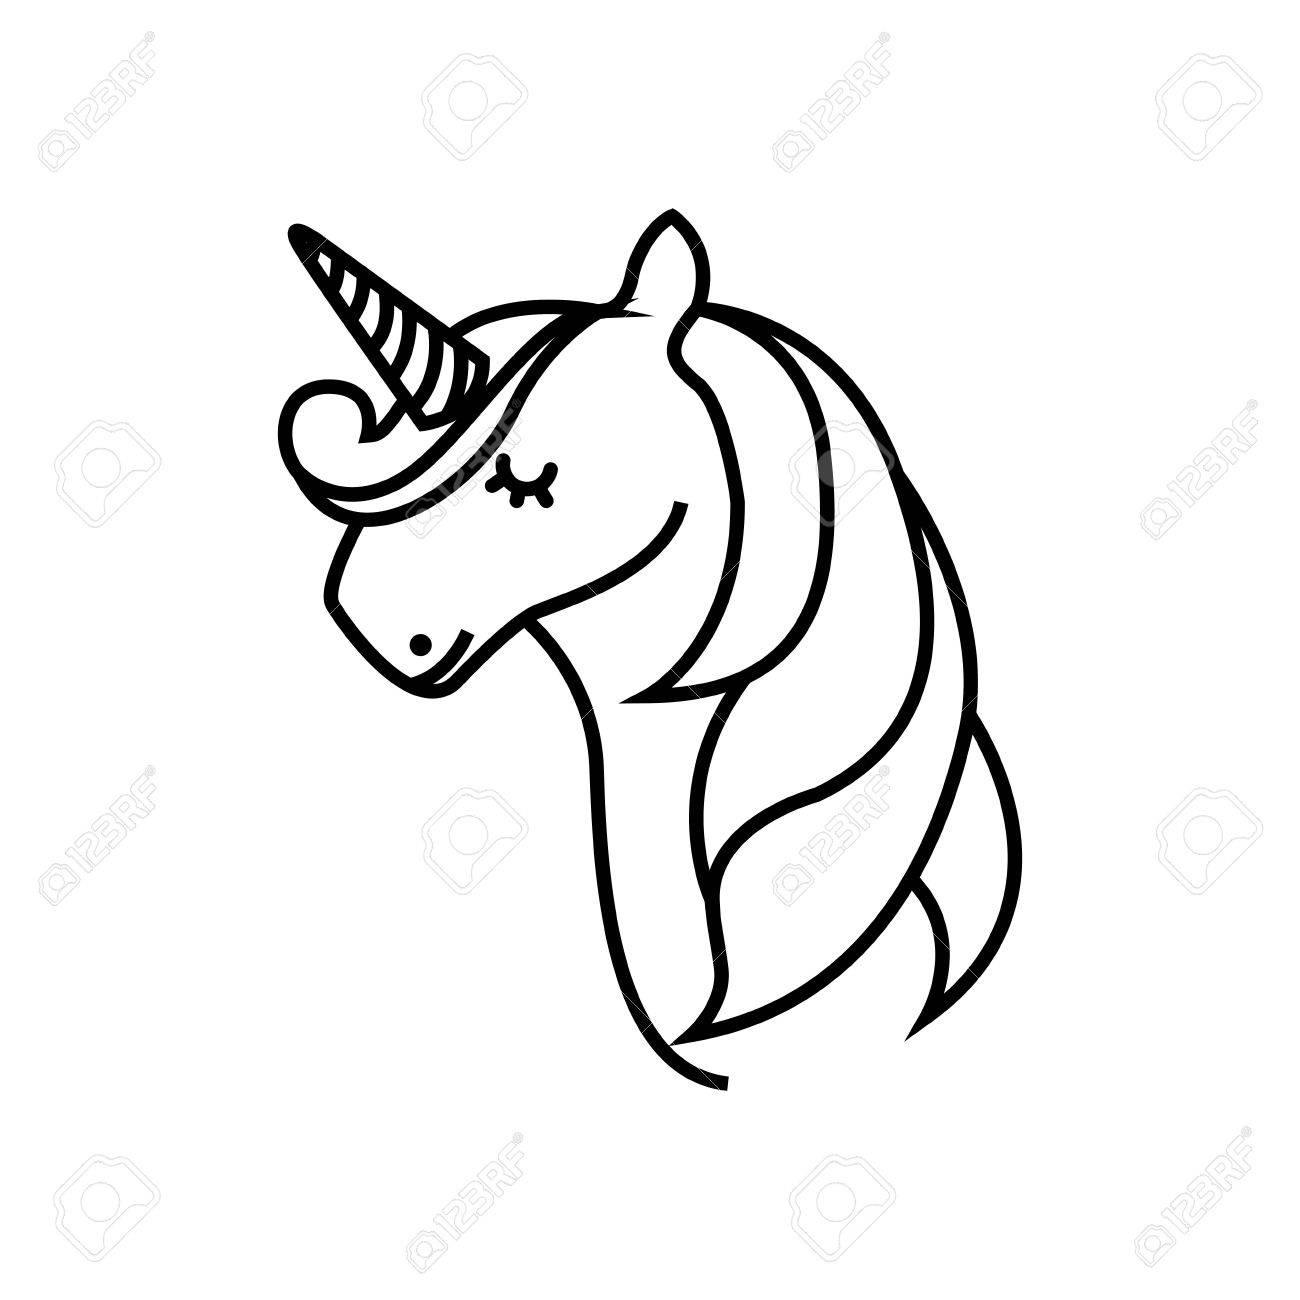 1300x1300 Drawing Cute Unicorn Icon Vector Illustration Design Royalty Free